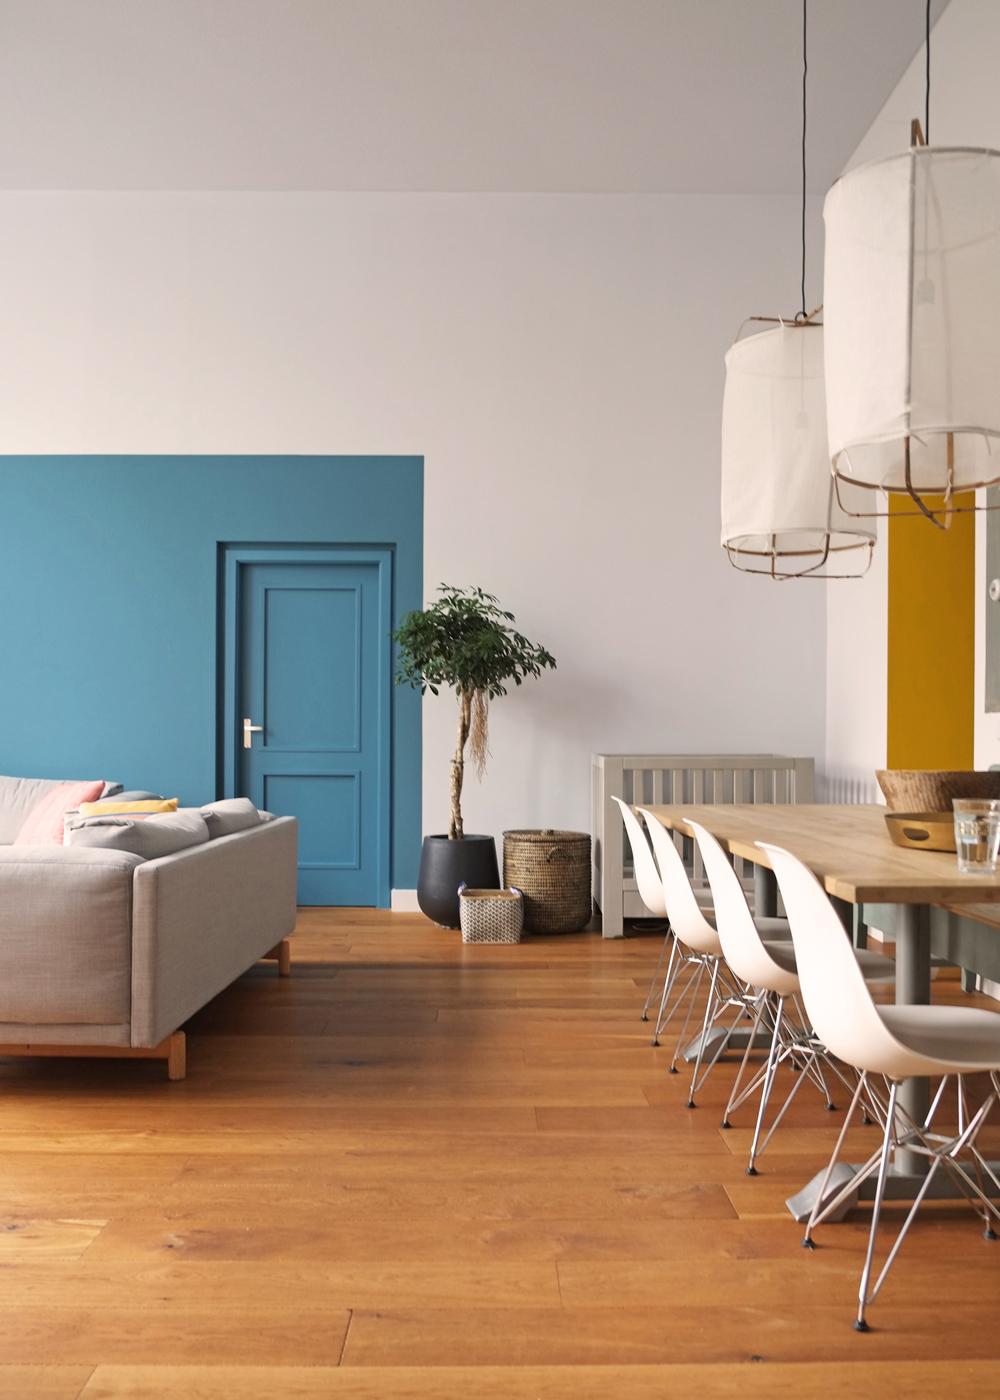 Kleur brengt sfeer in de ruimte pimpelwit styling interieurontwerp en styling advies - Interieurontwerp thuis kleur ...